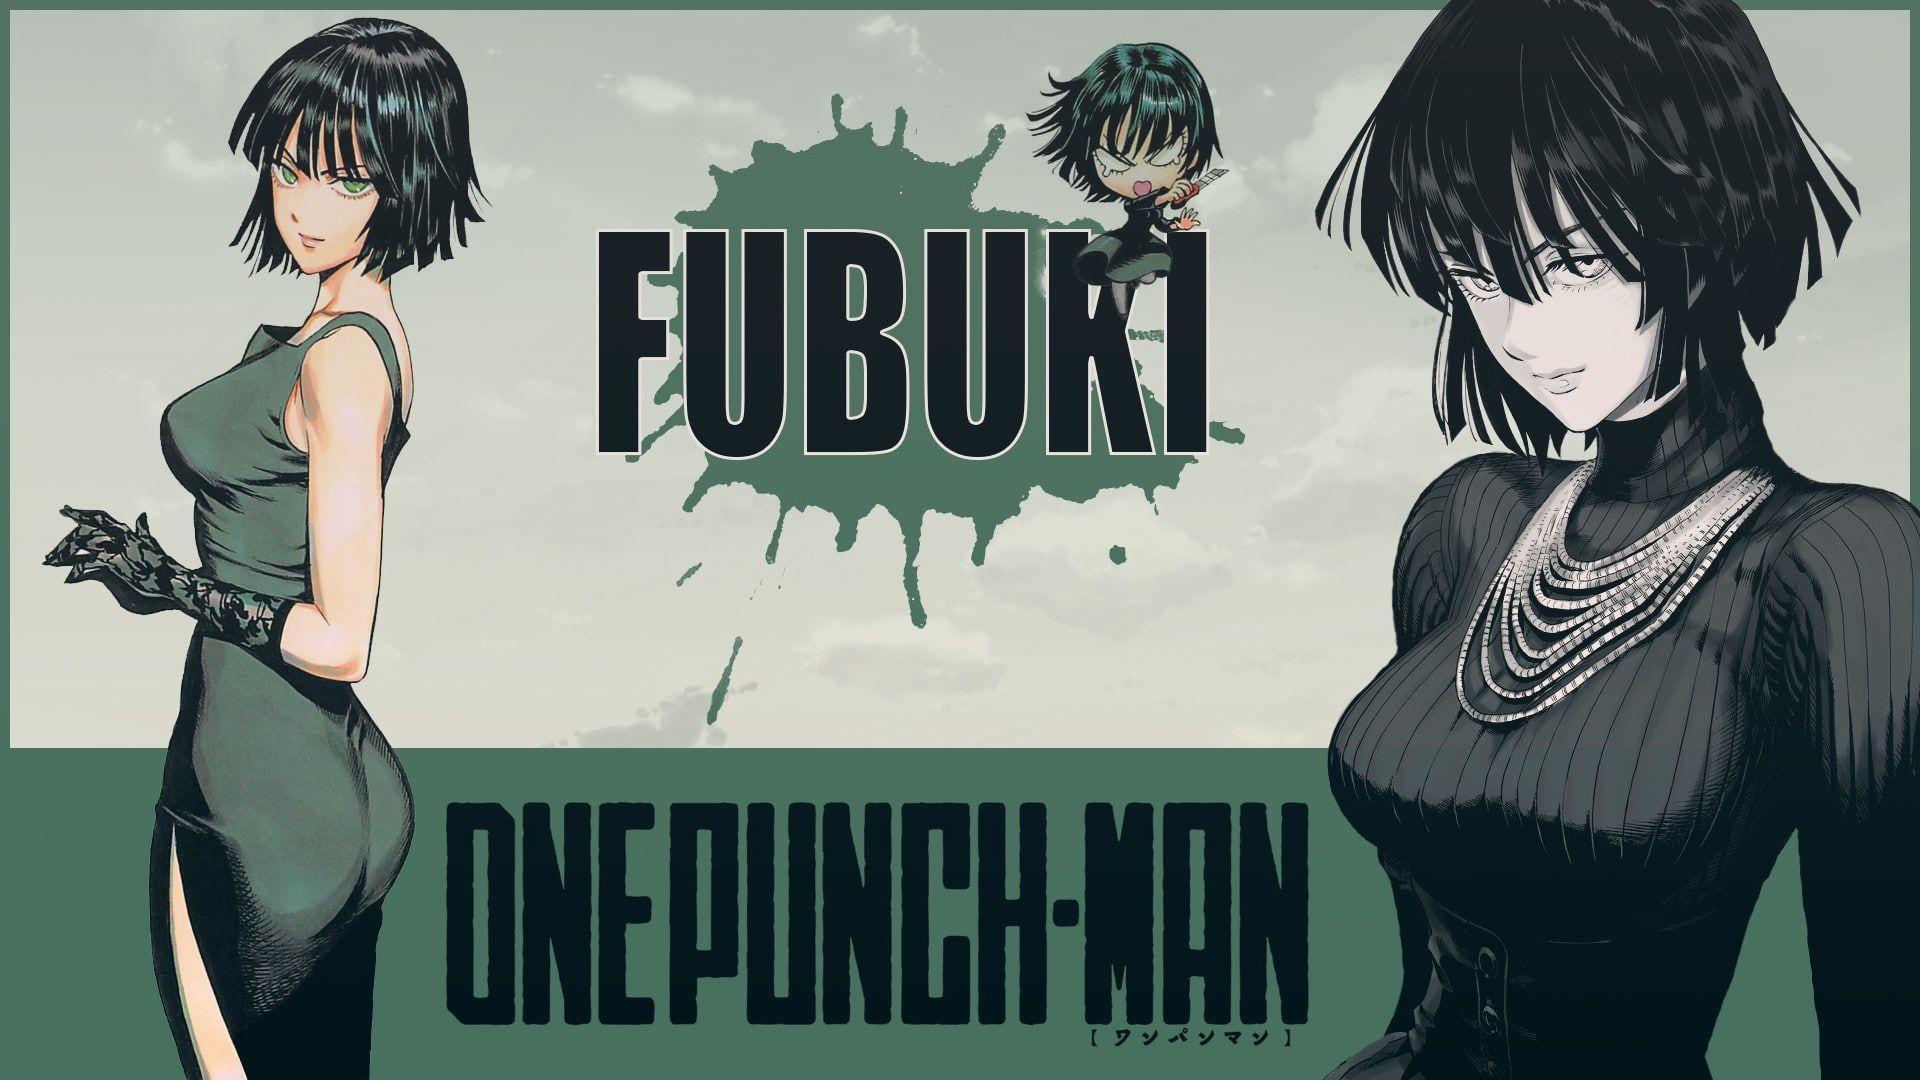 Anime Girls One Punch Man Fubuki Green Eyes 1080p Wallpaper Hdwallpaper Desktop One Punch Man Anime One Punch Man One Punch